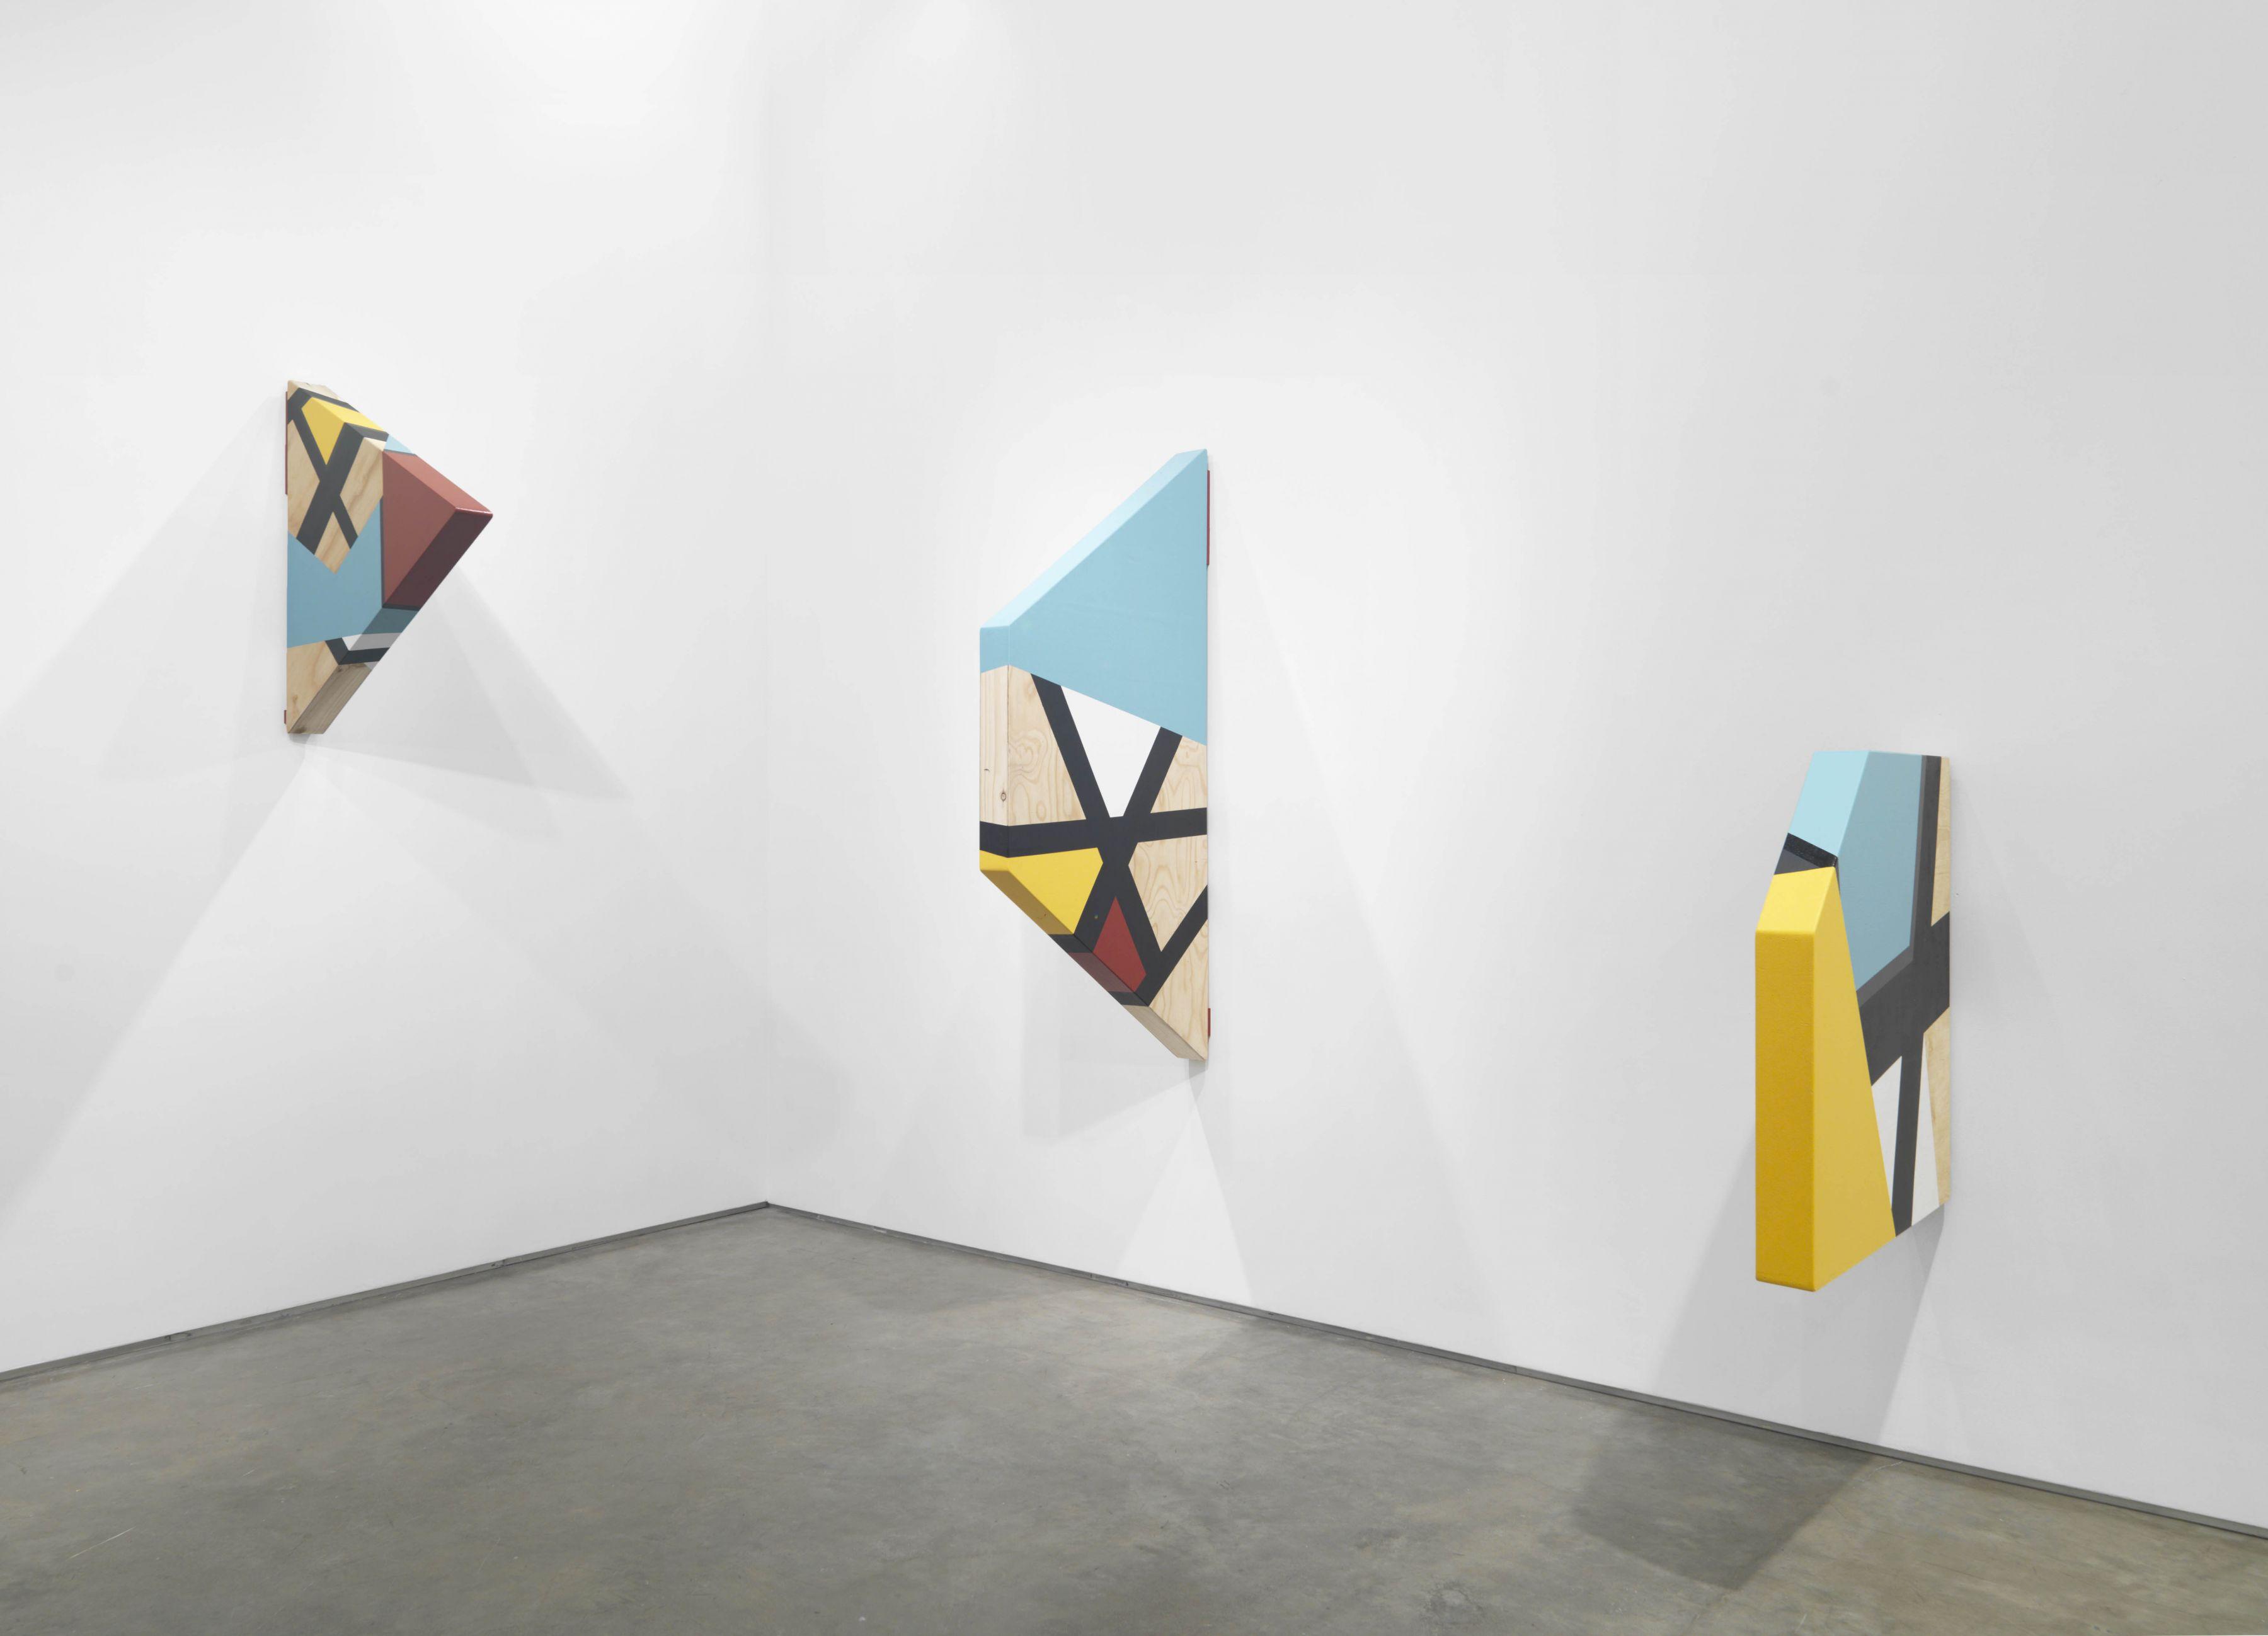 chelsea gallery exhibition of the art work by serge alain nitegeka